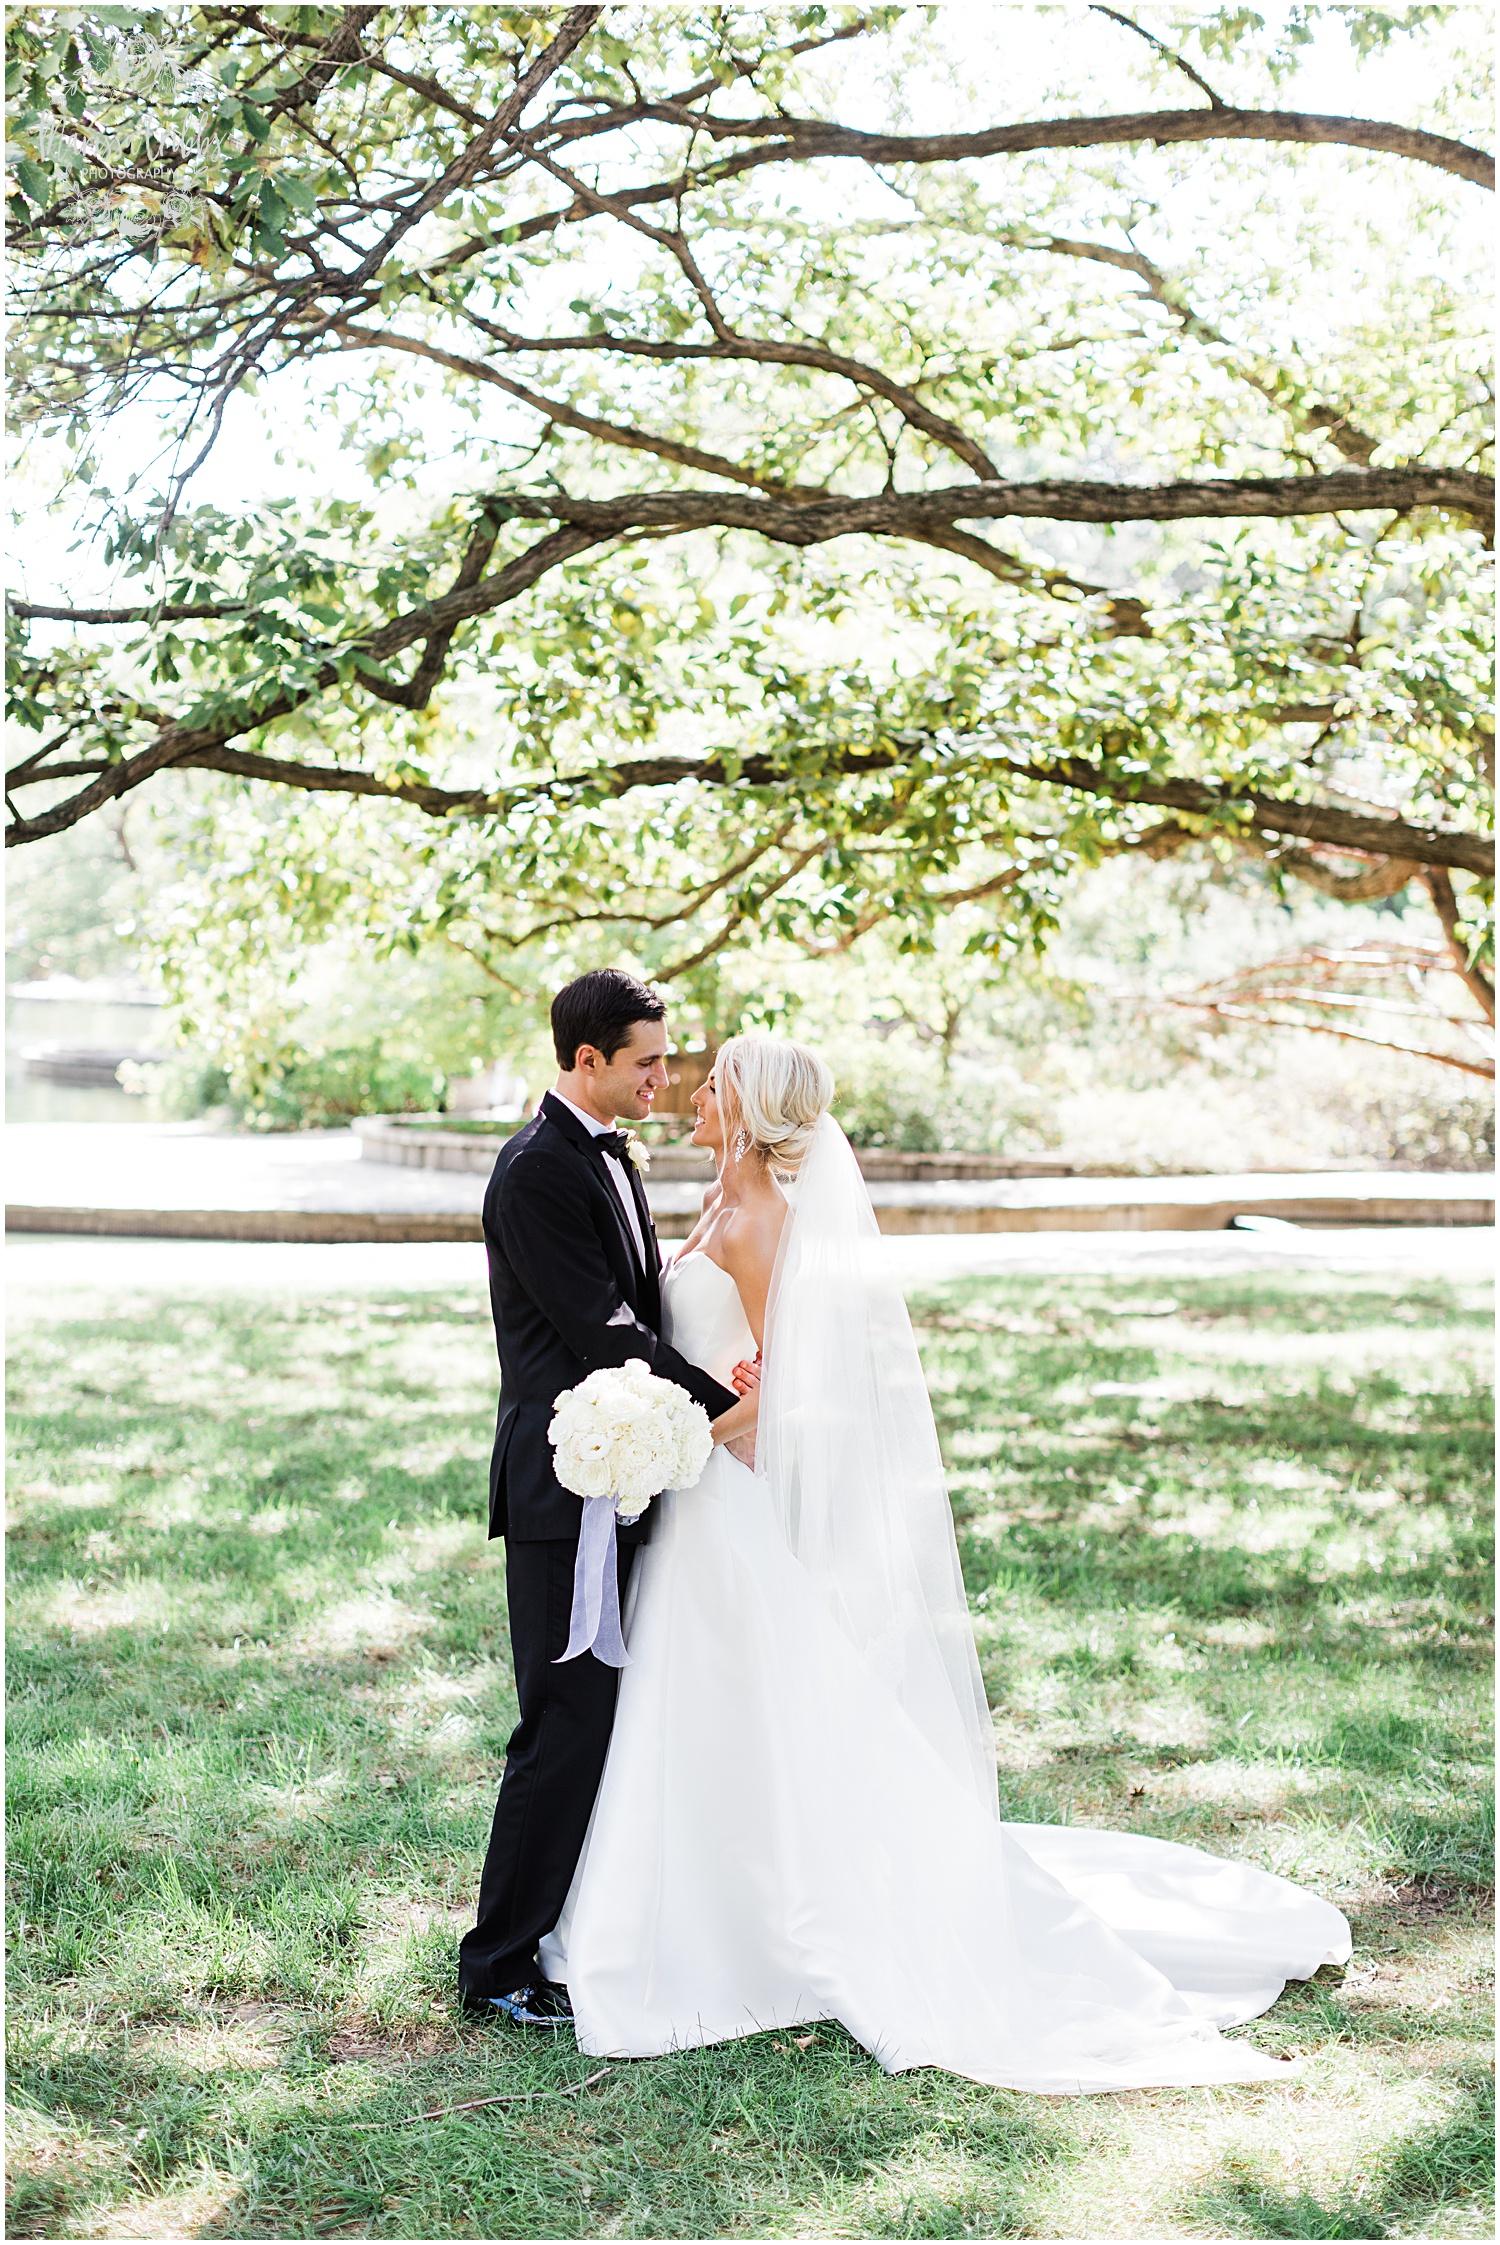 NOLL WEDDING | THE BRASS ON BALTIMORE | MARISSA CRIBBS PHOTOGRAPHY_6308.jpg